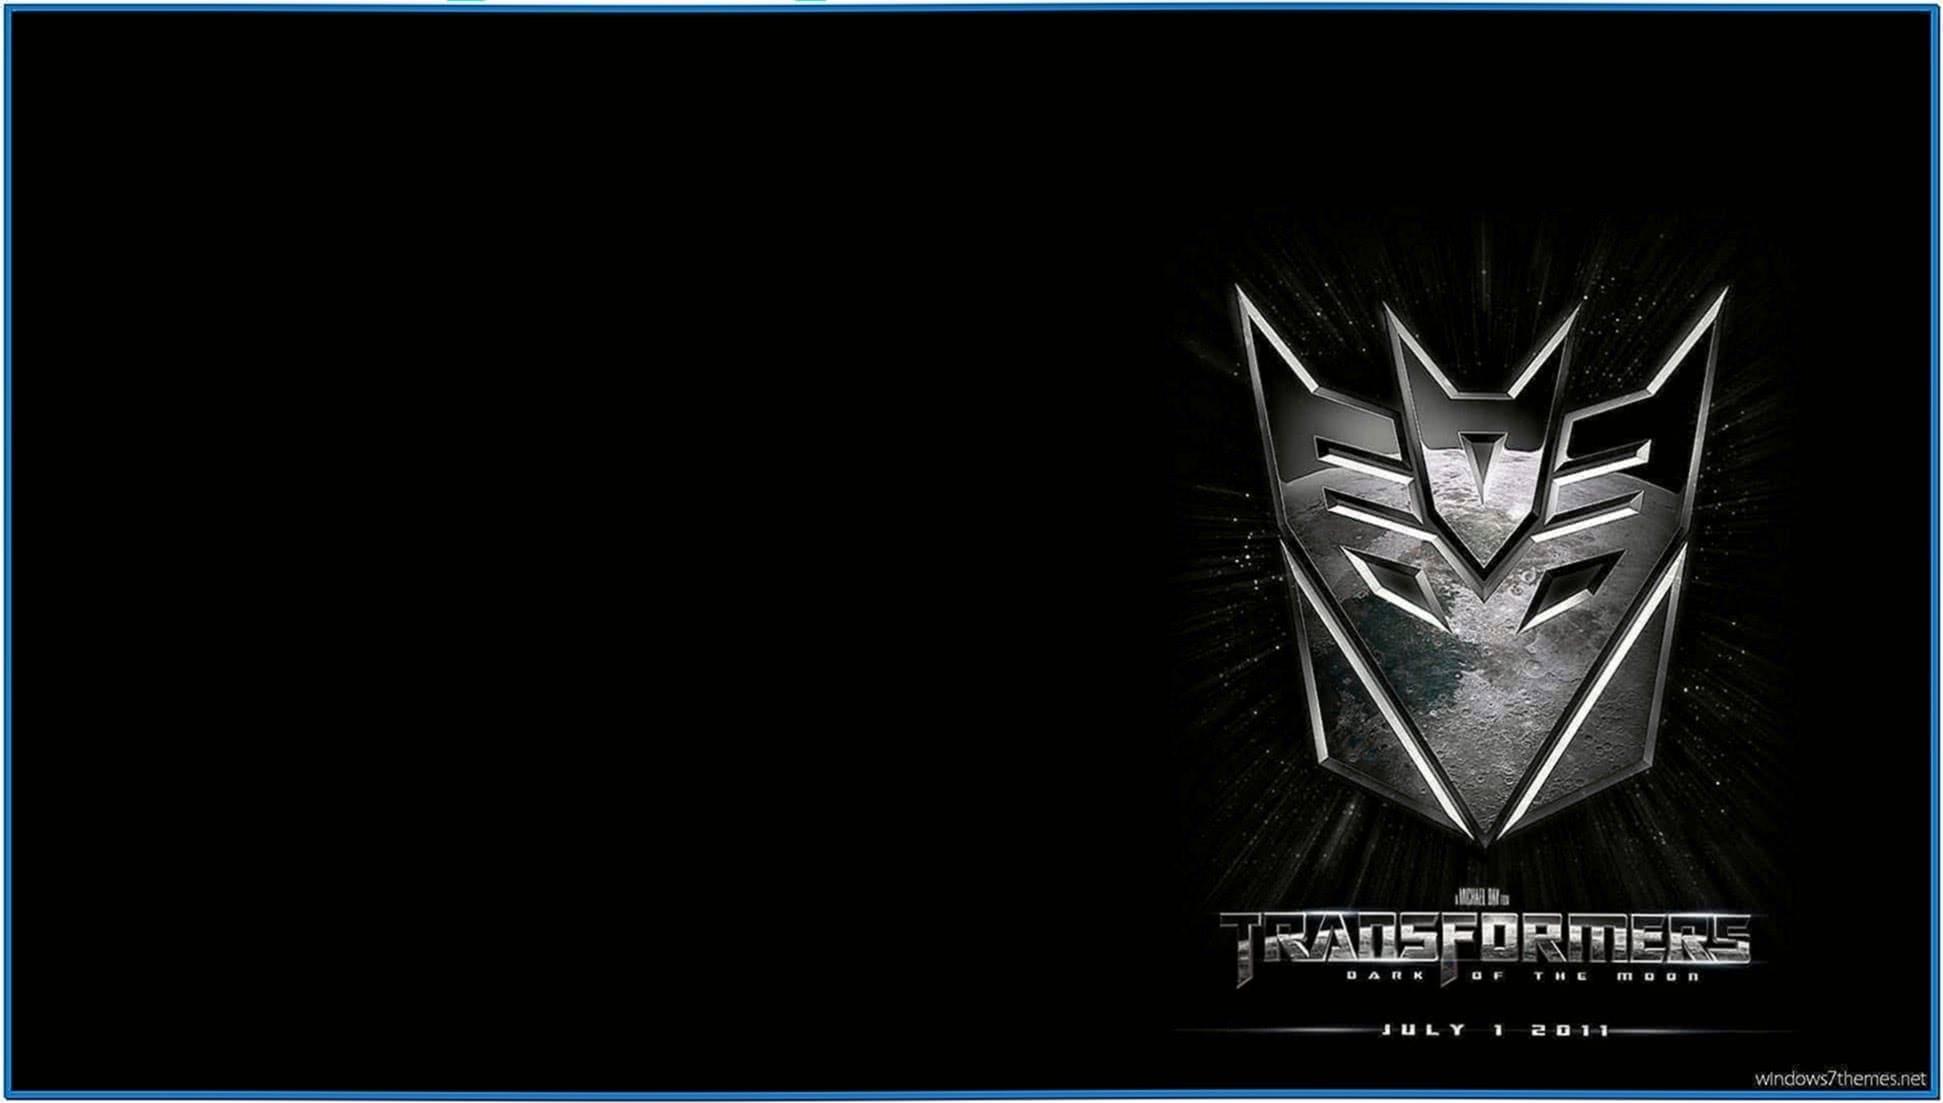 Transformers 3 Screensaver Mac